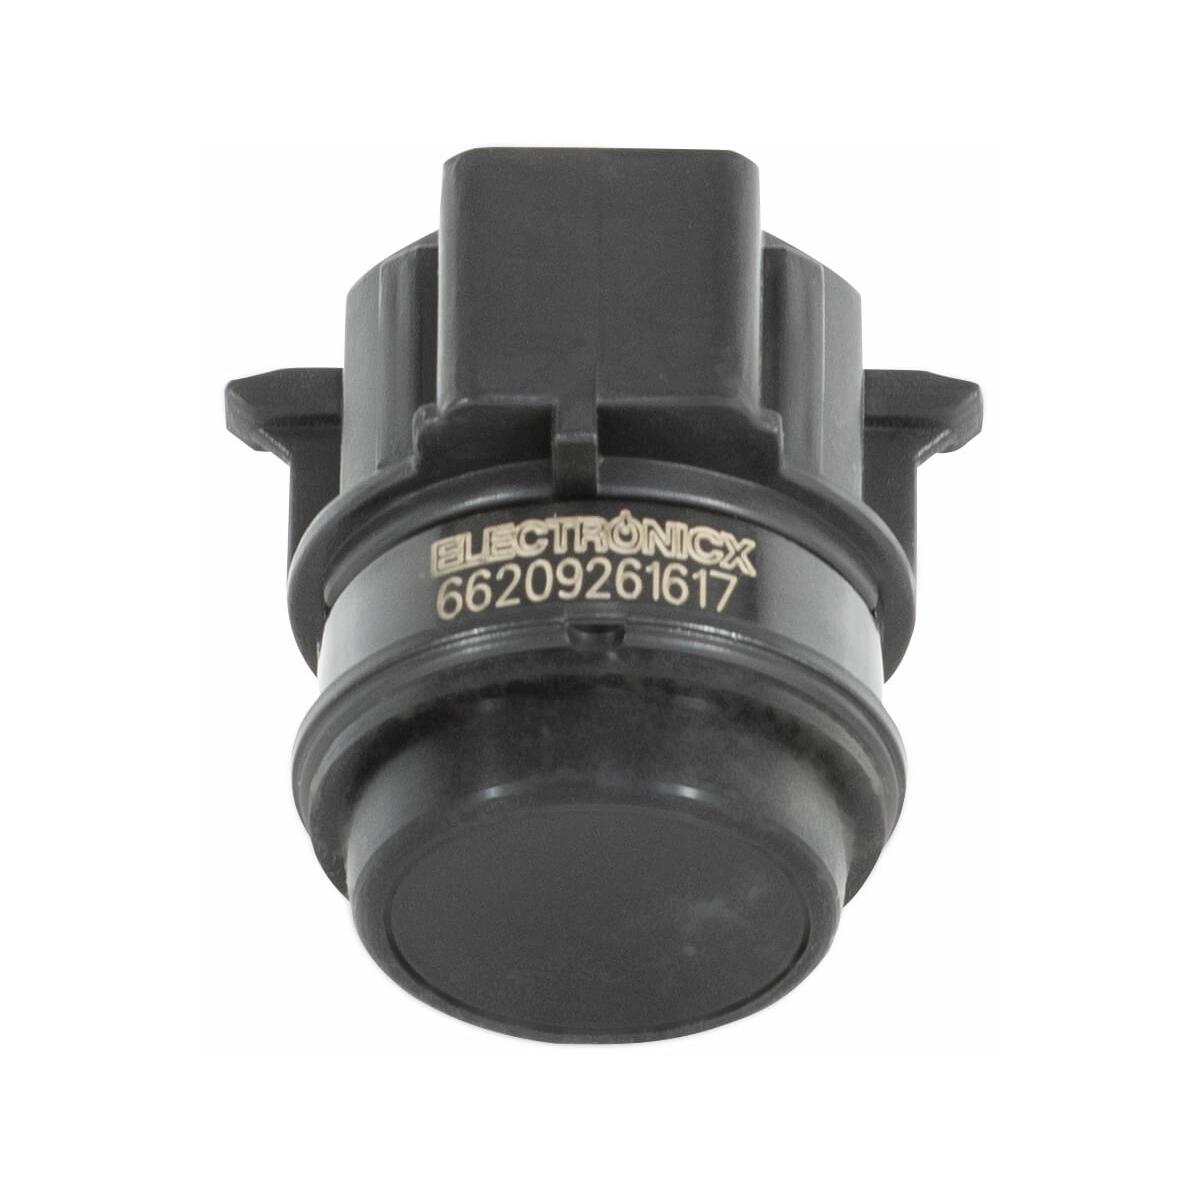 Park sensor 66209261617 for BMW PDC Parktronic